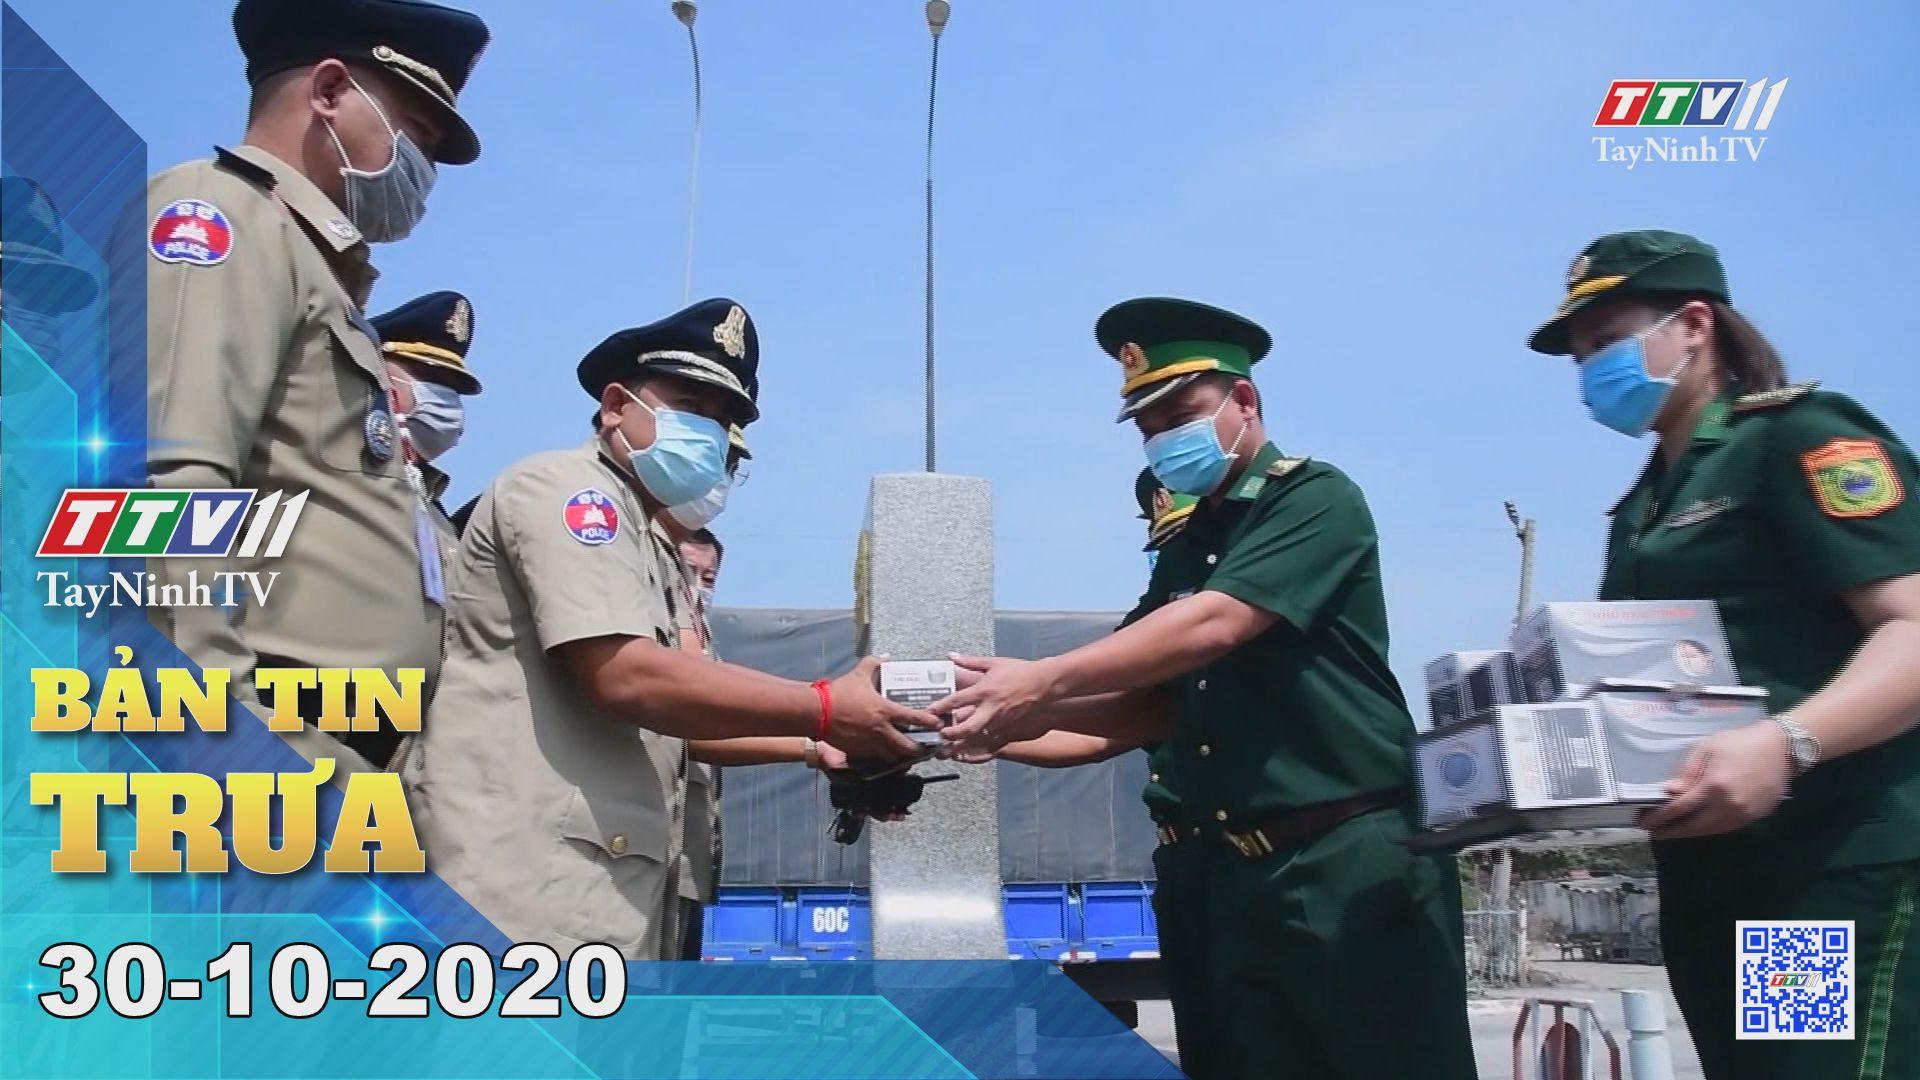 Bản tin trưa 30-10-2020 | Tin tức hôm nay | TayNinhTV